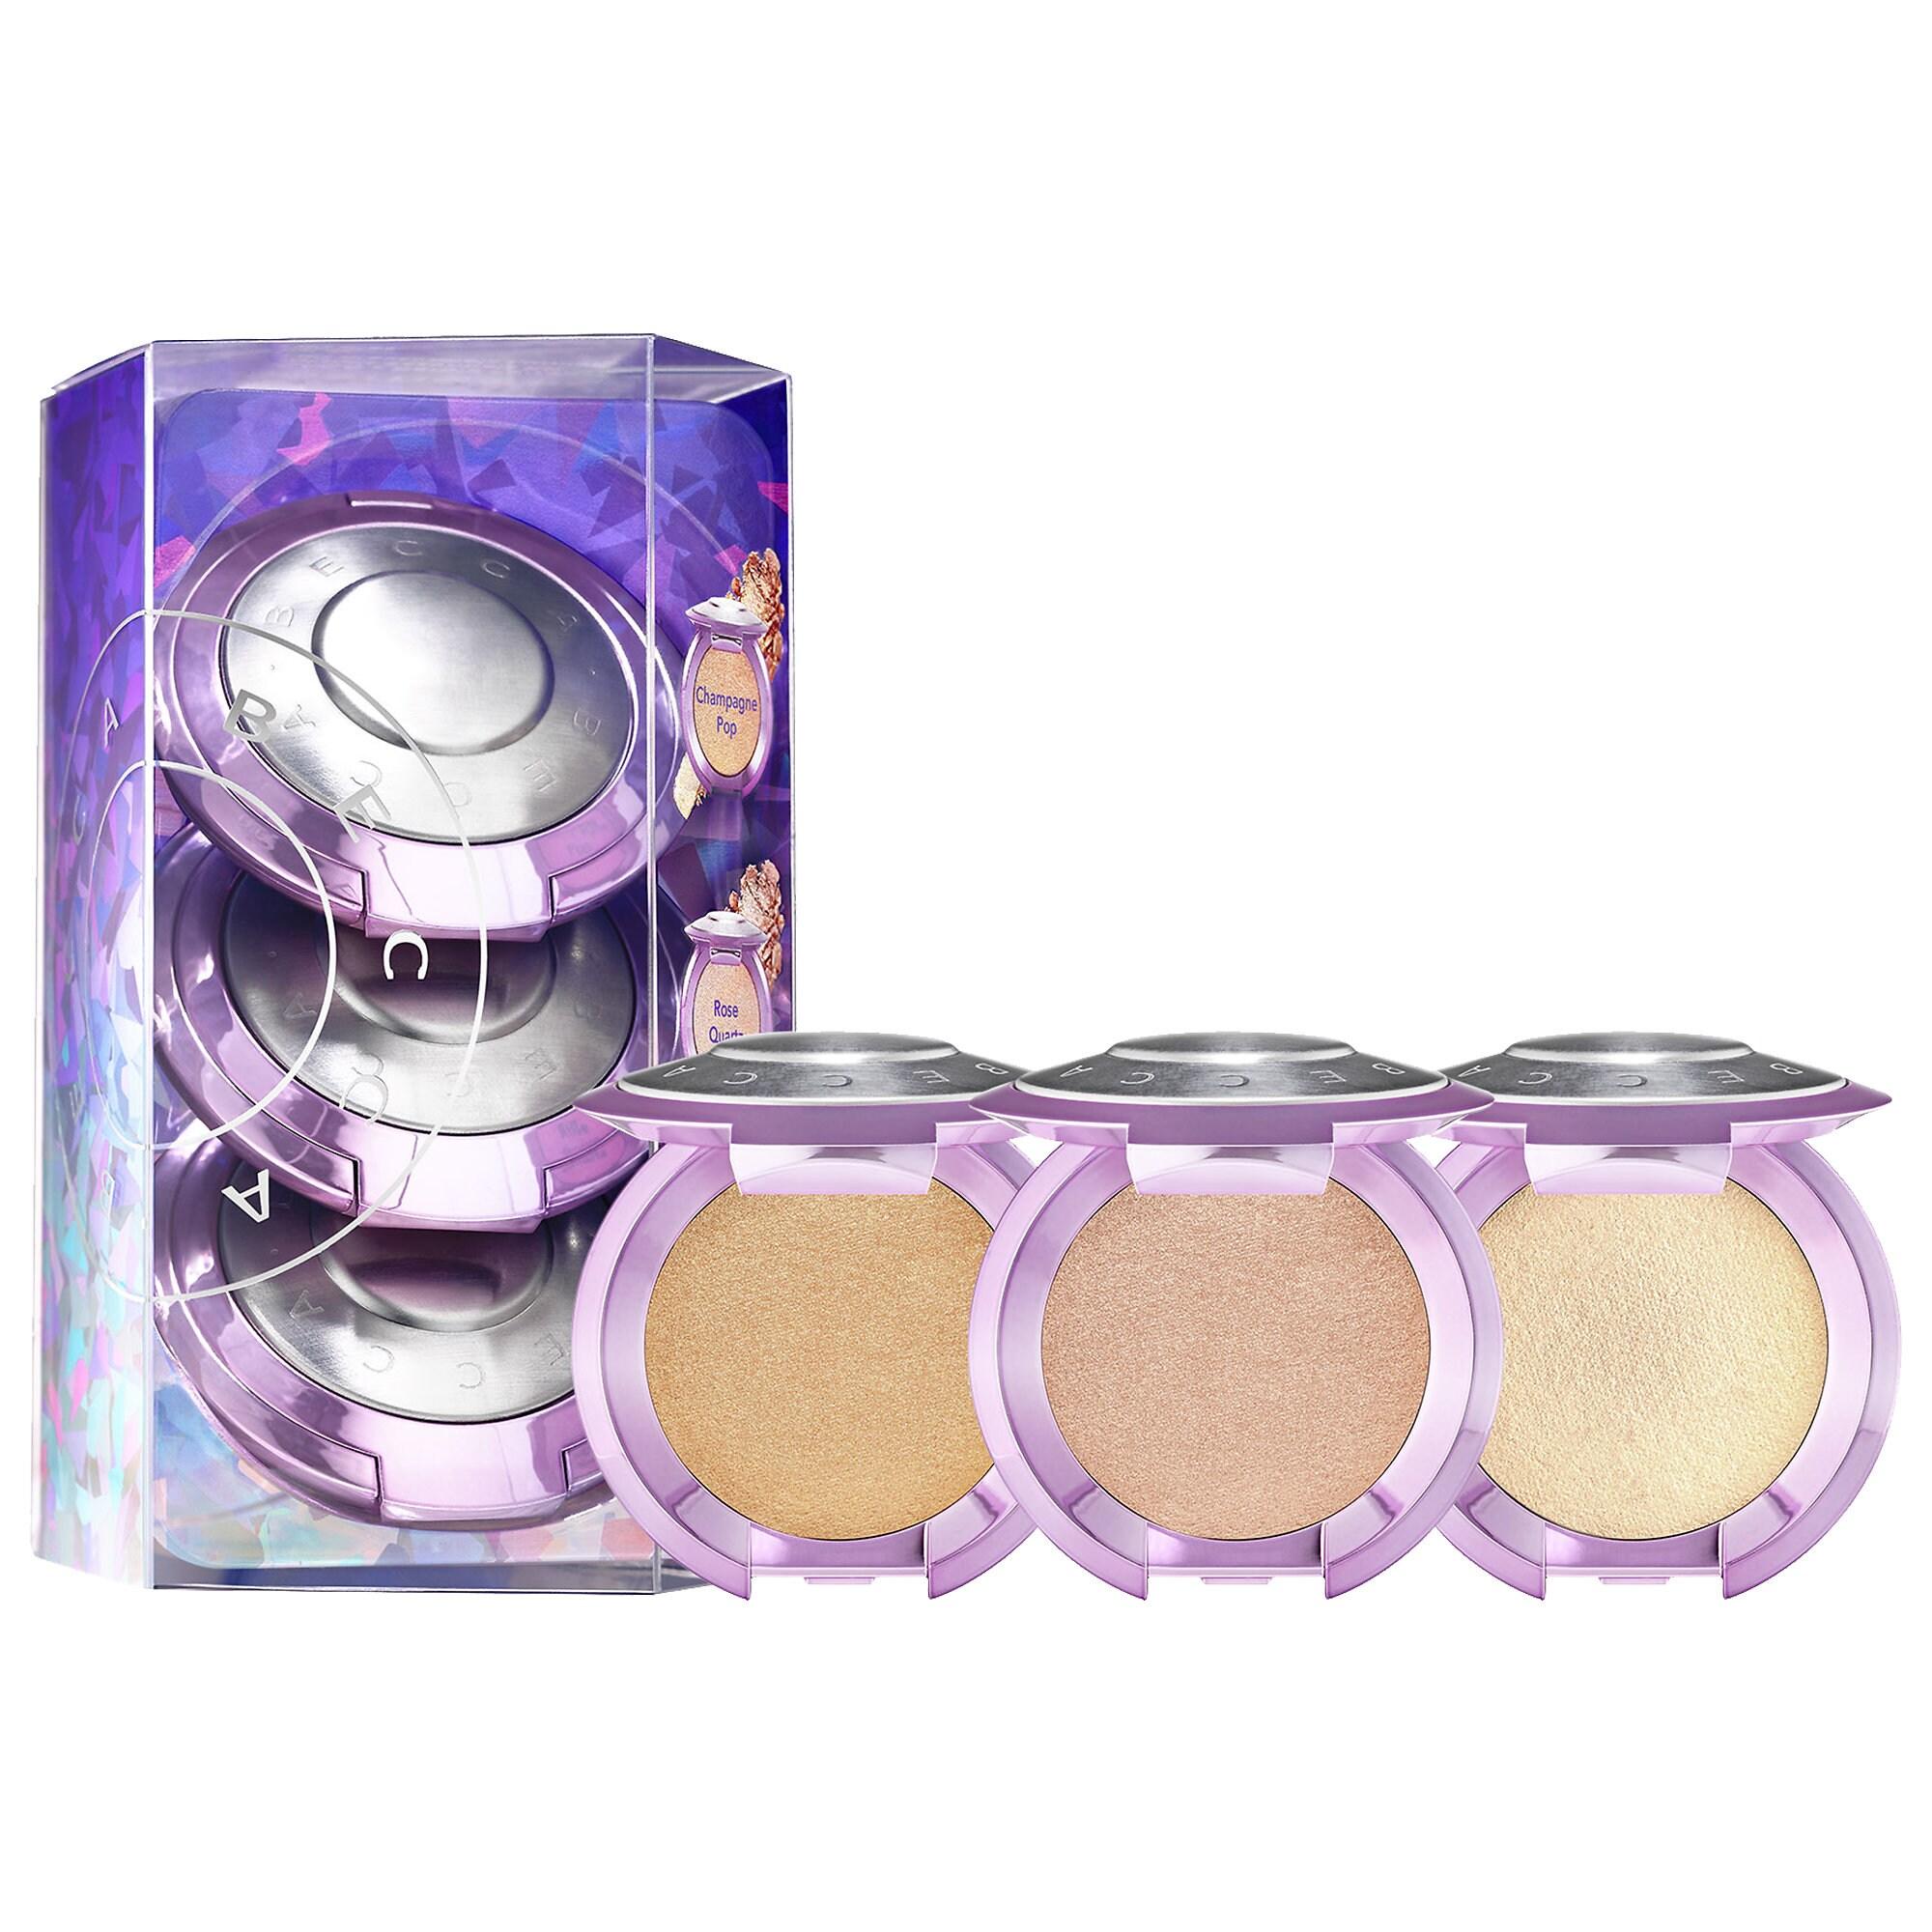 Becca Cosmetics - Mini Barbie Ferreira Prismatica Light Essentials Kit